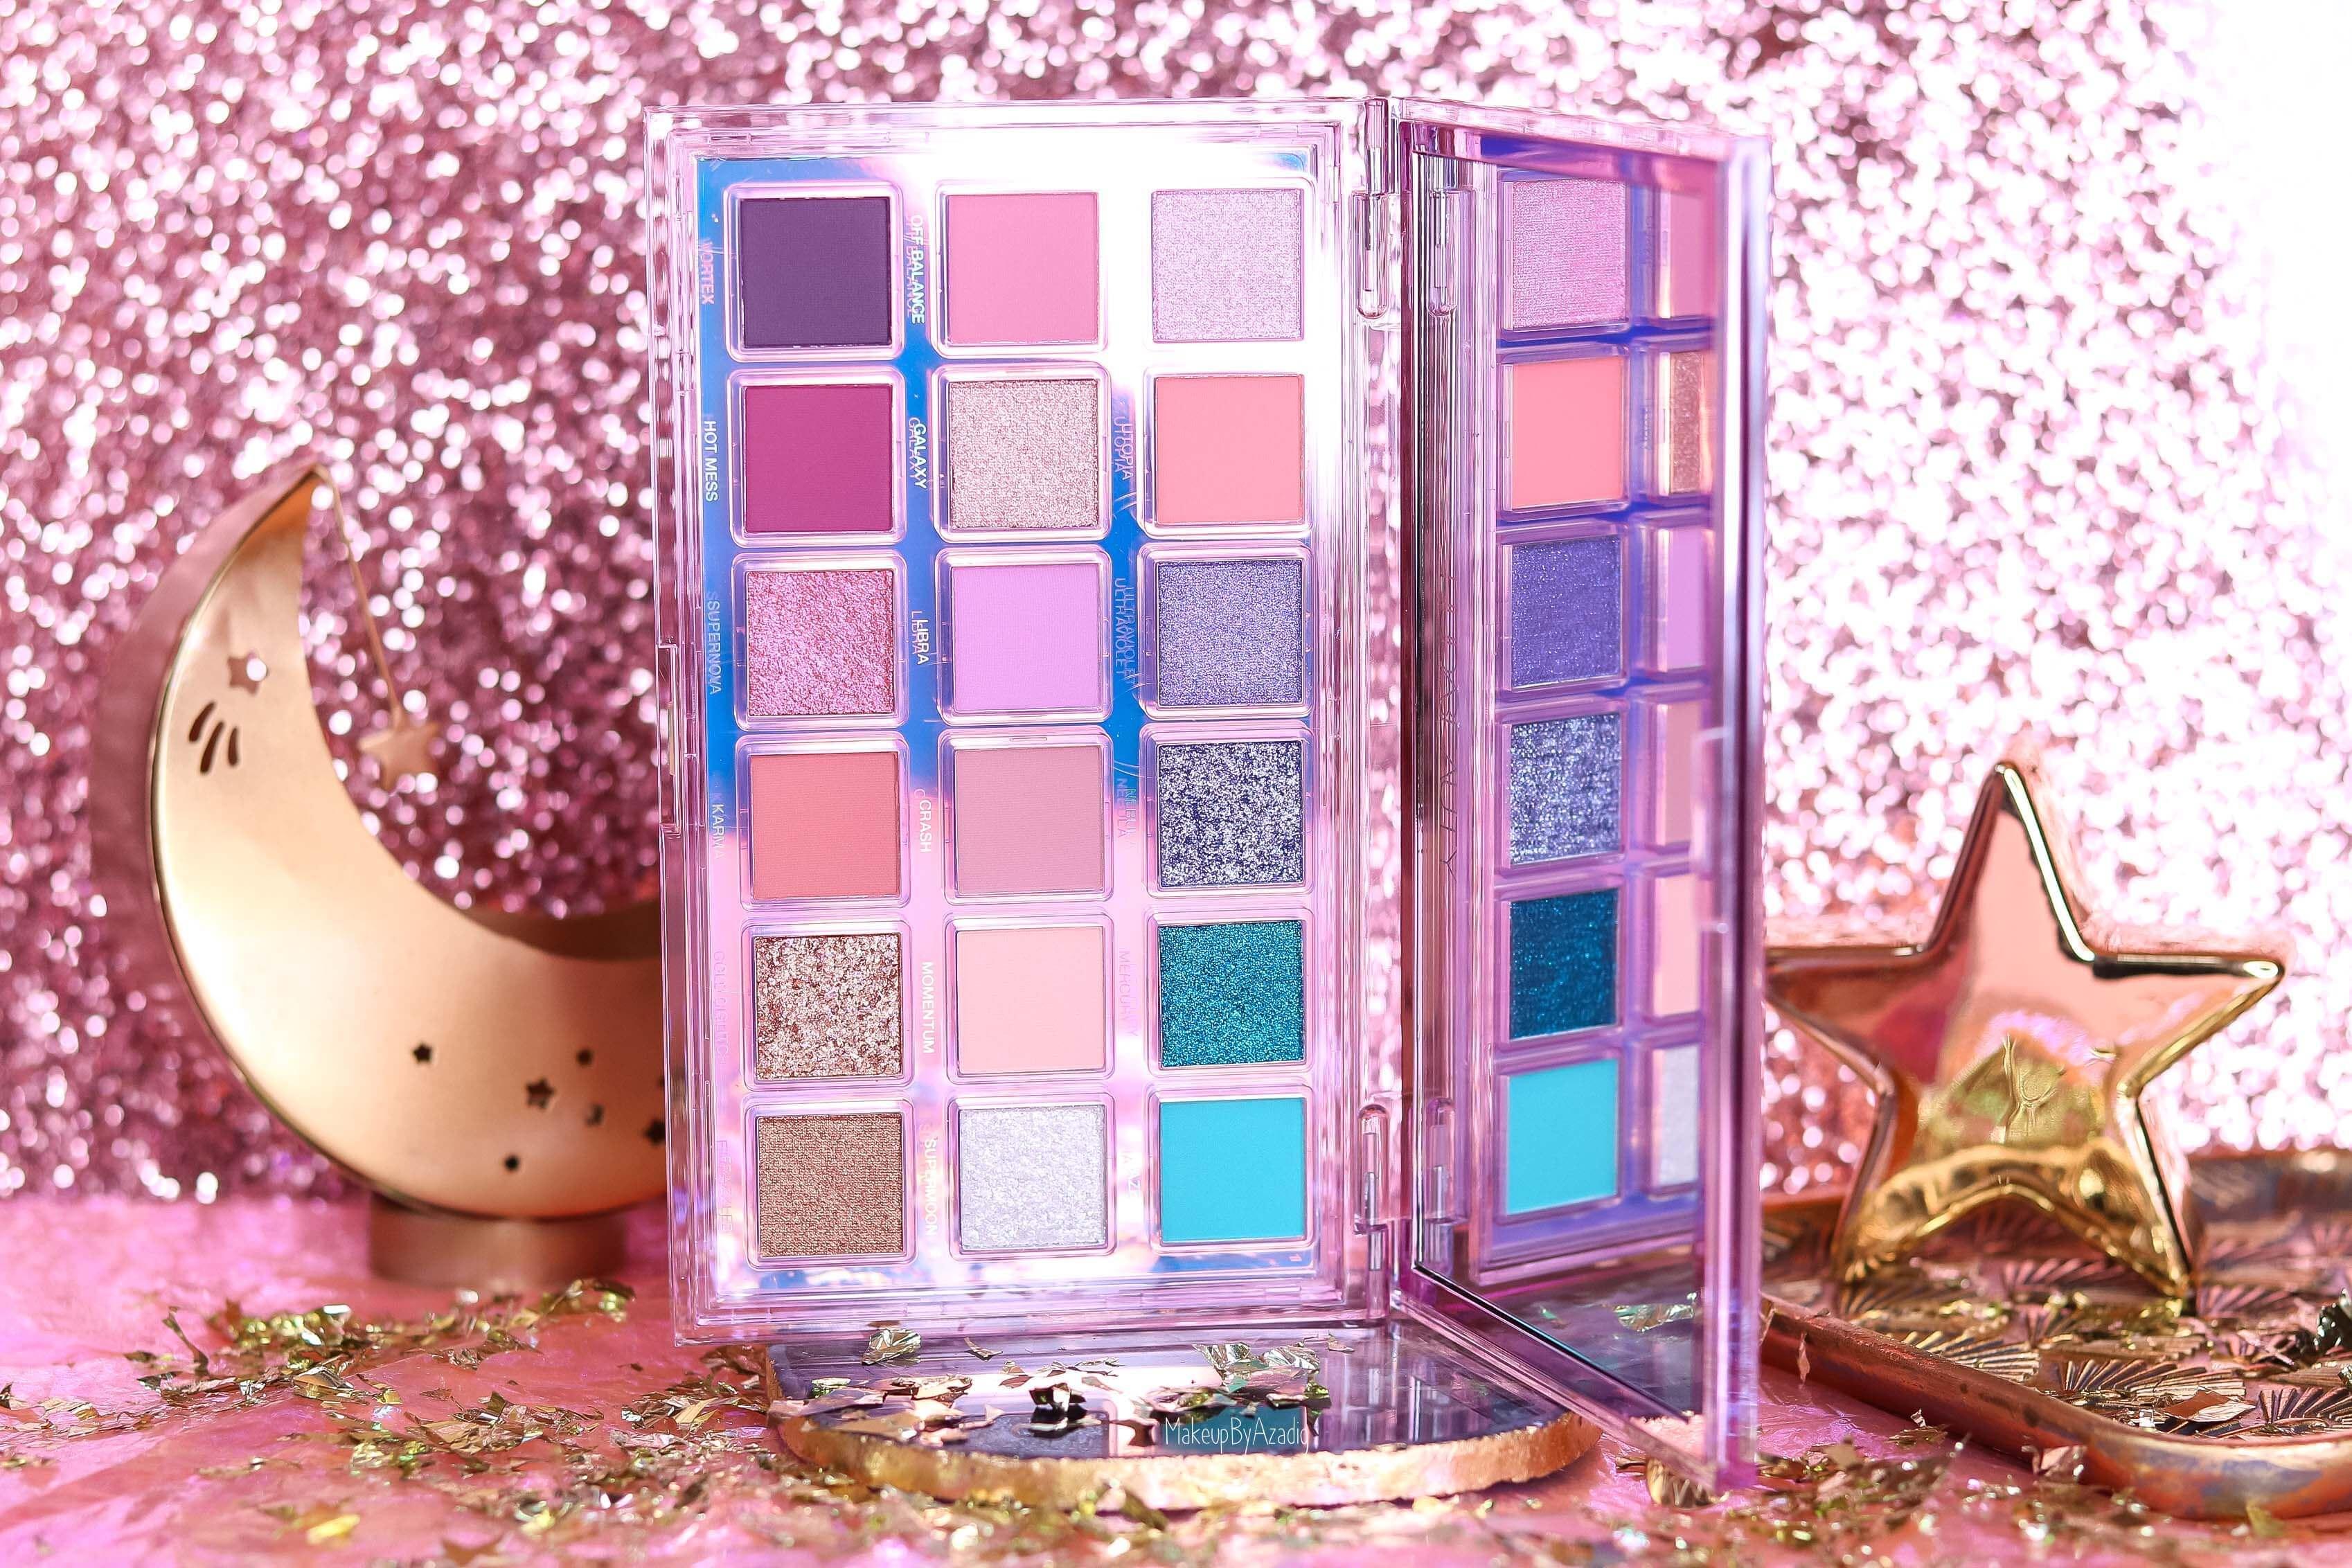 revue-palette-mercury-retrograde-huda-beauty-sephora-france-makeupbyazadig-avis-prix-swatch-astrologie-colors